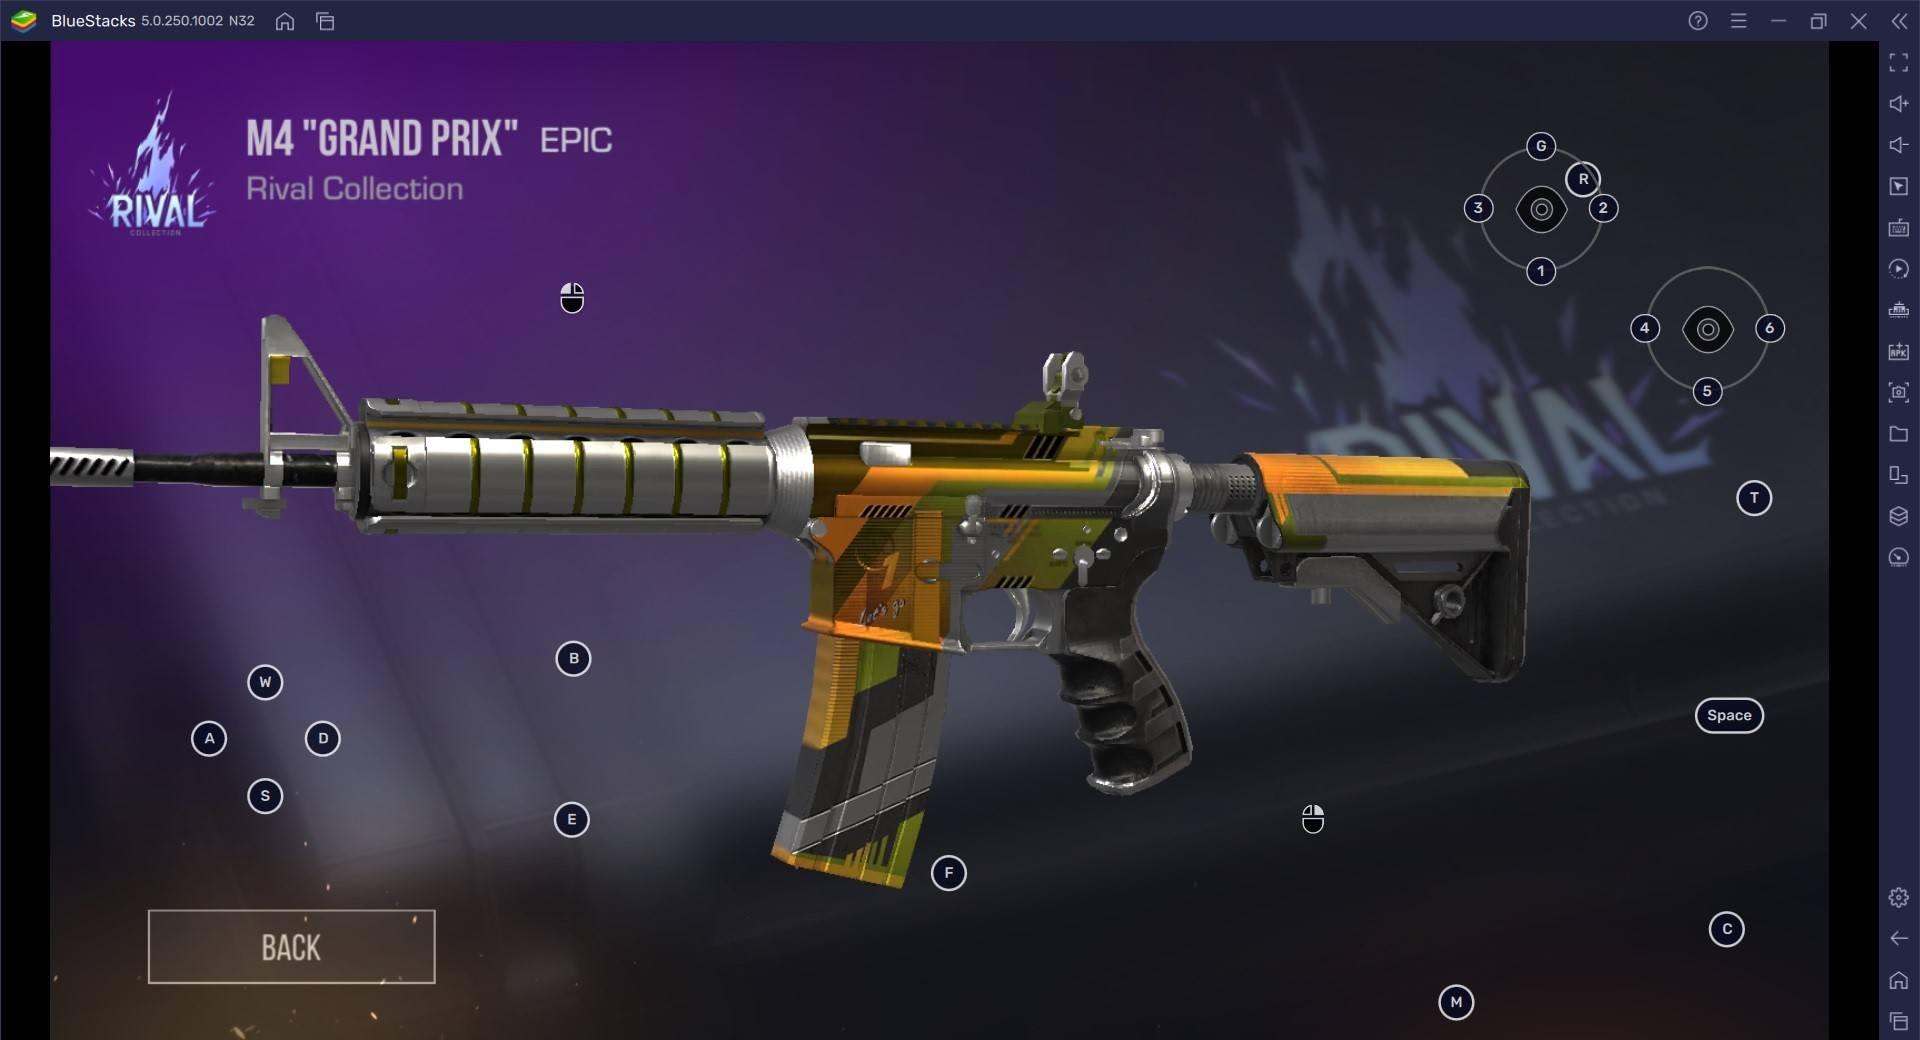 Standoff 2 Weapon Comparison Guide: AKR vs M4